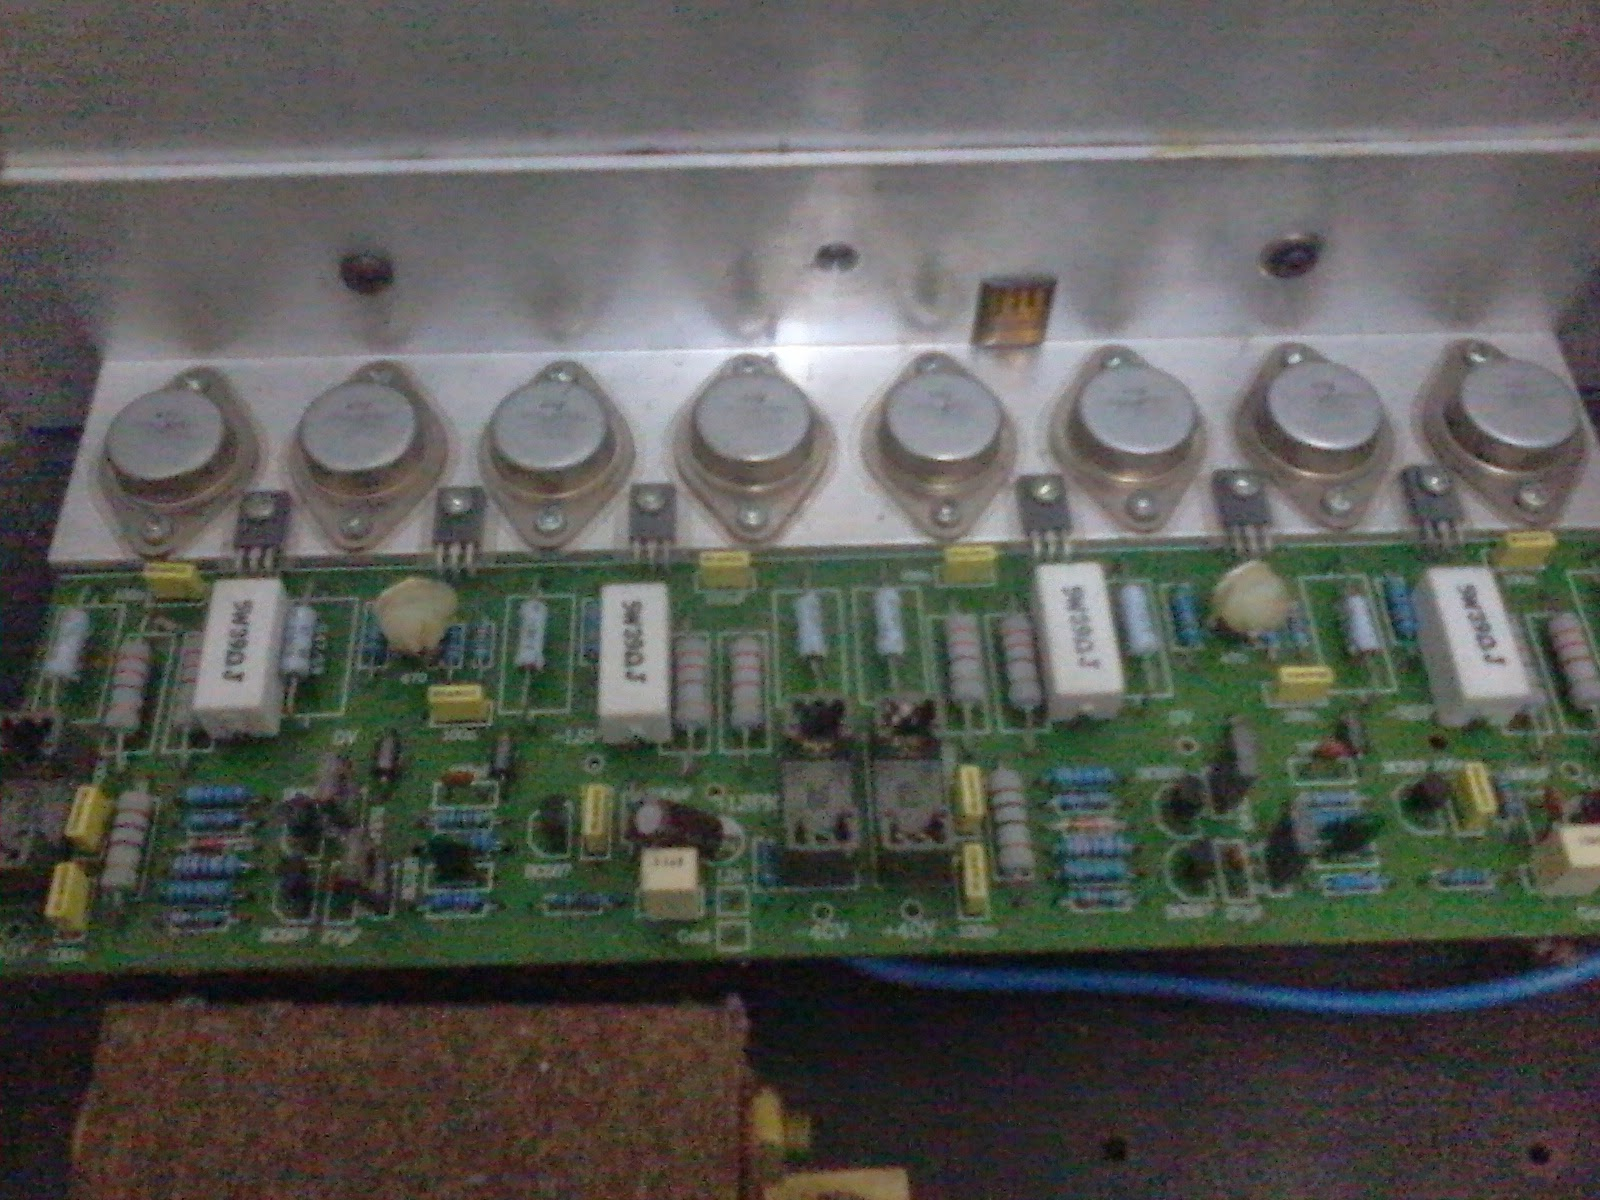 belajar membuat sendiri power amplifier rakitan electronic hobbiest for audio system. Black Bedroom Furniture Sets. Home Design Ideas